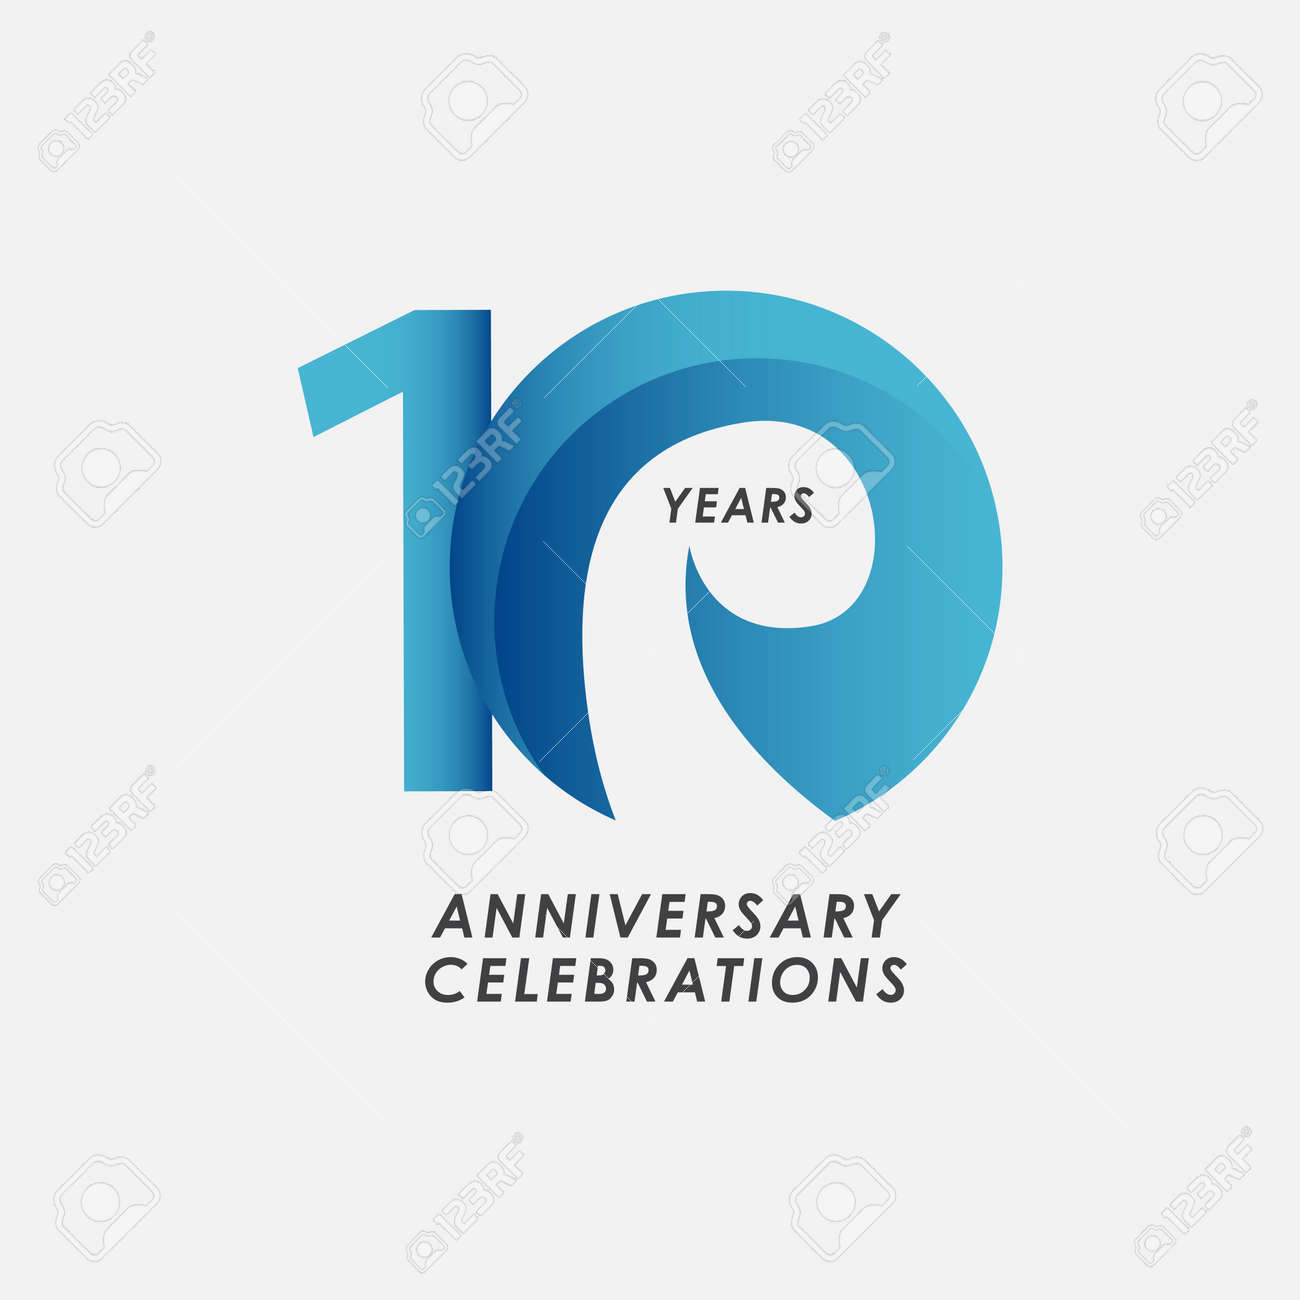 10 Years Anniversary Celebrations Vector Template Design Illustration - 163697991